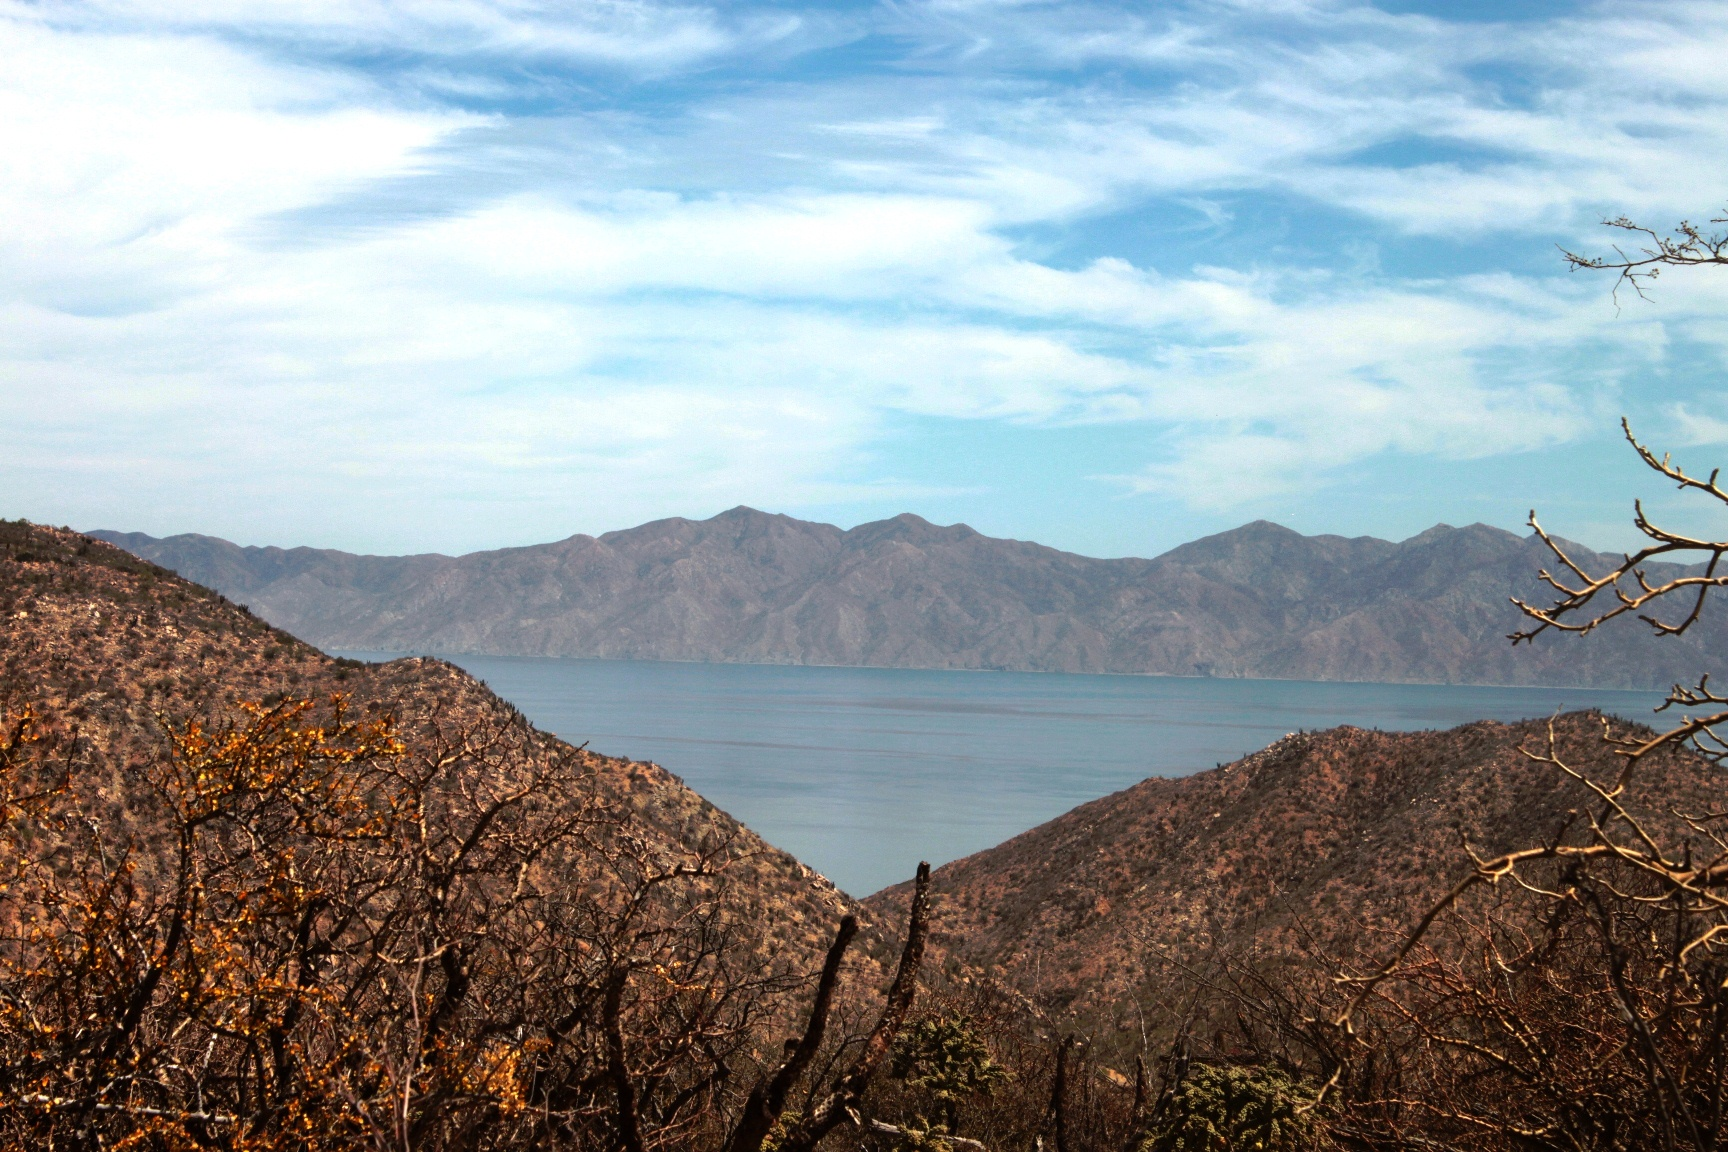 Vista Isla Cerralvo desde Rancho Cacachilas, BCS